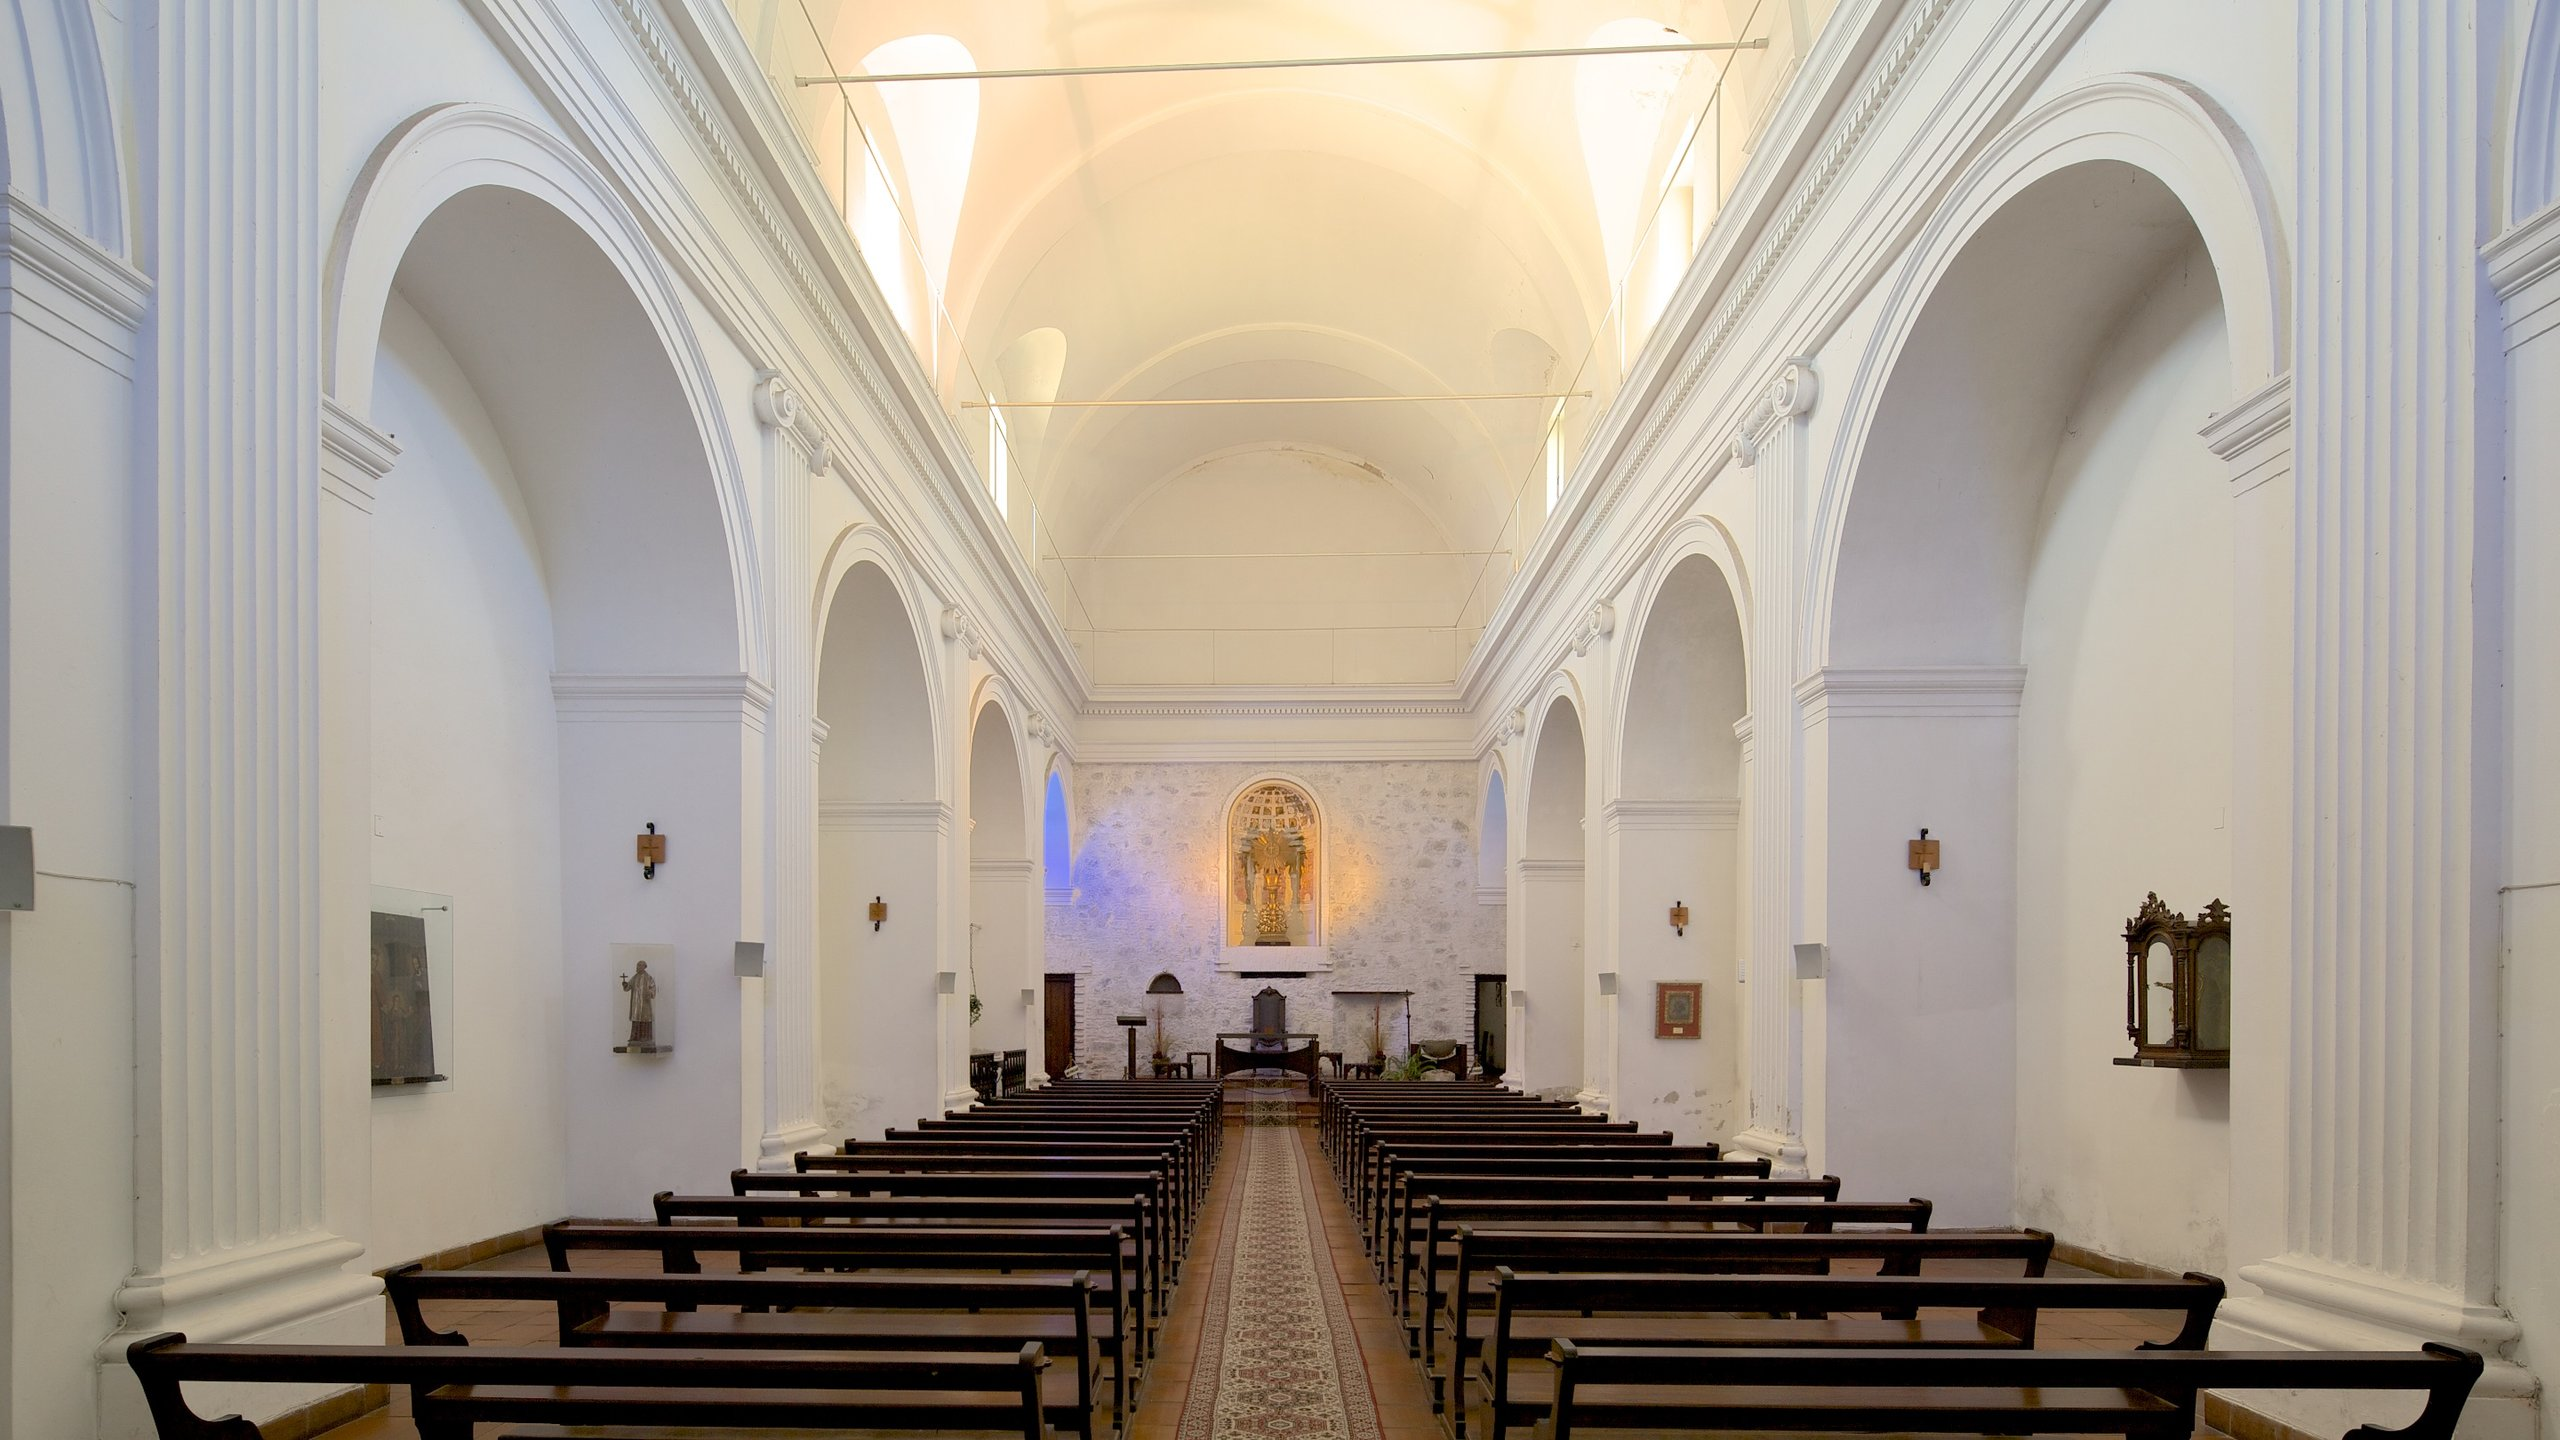 Barrio Histórico, Colonia del Sacramento, Colonia, Uruguay